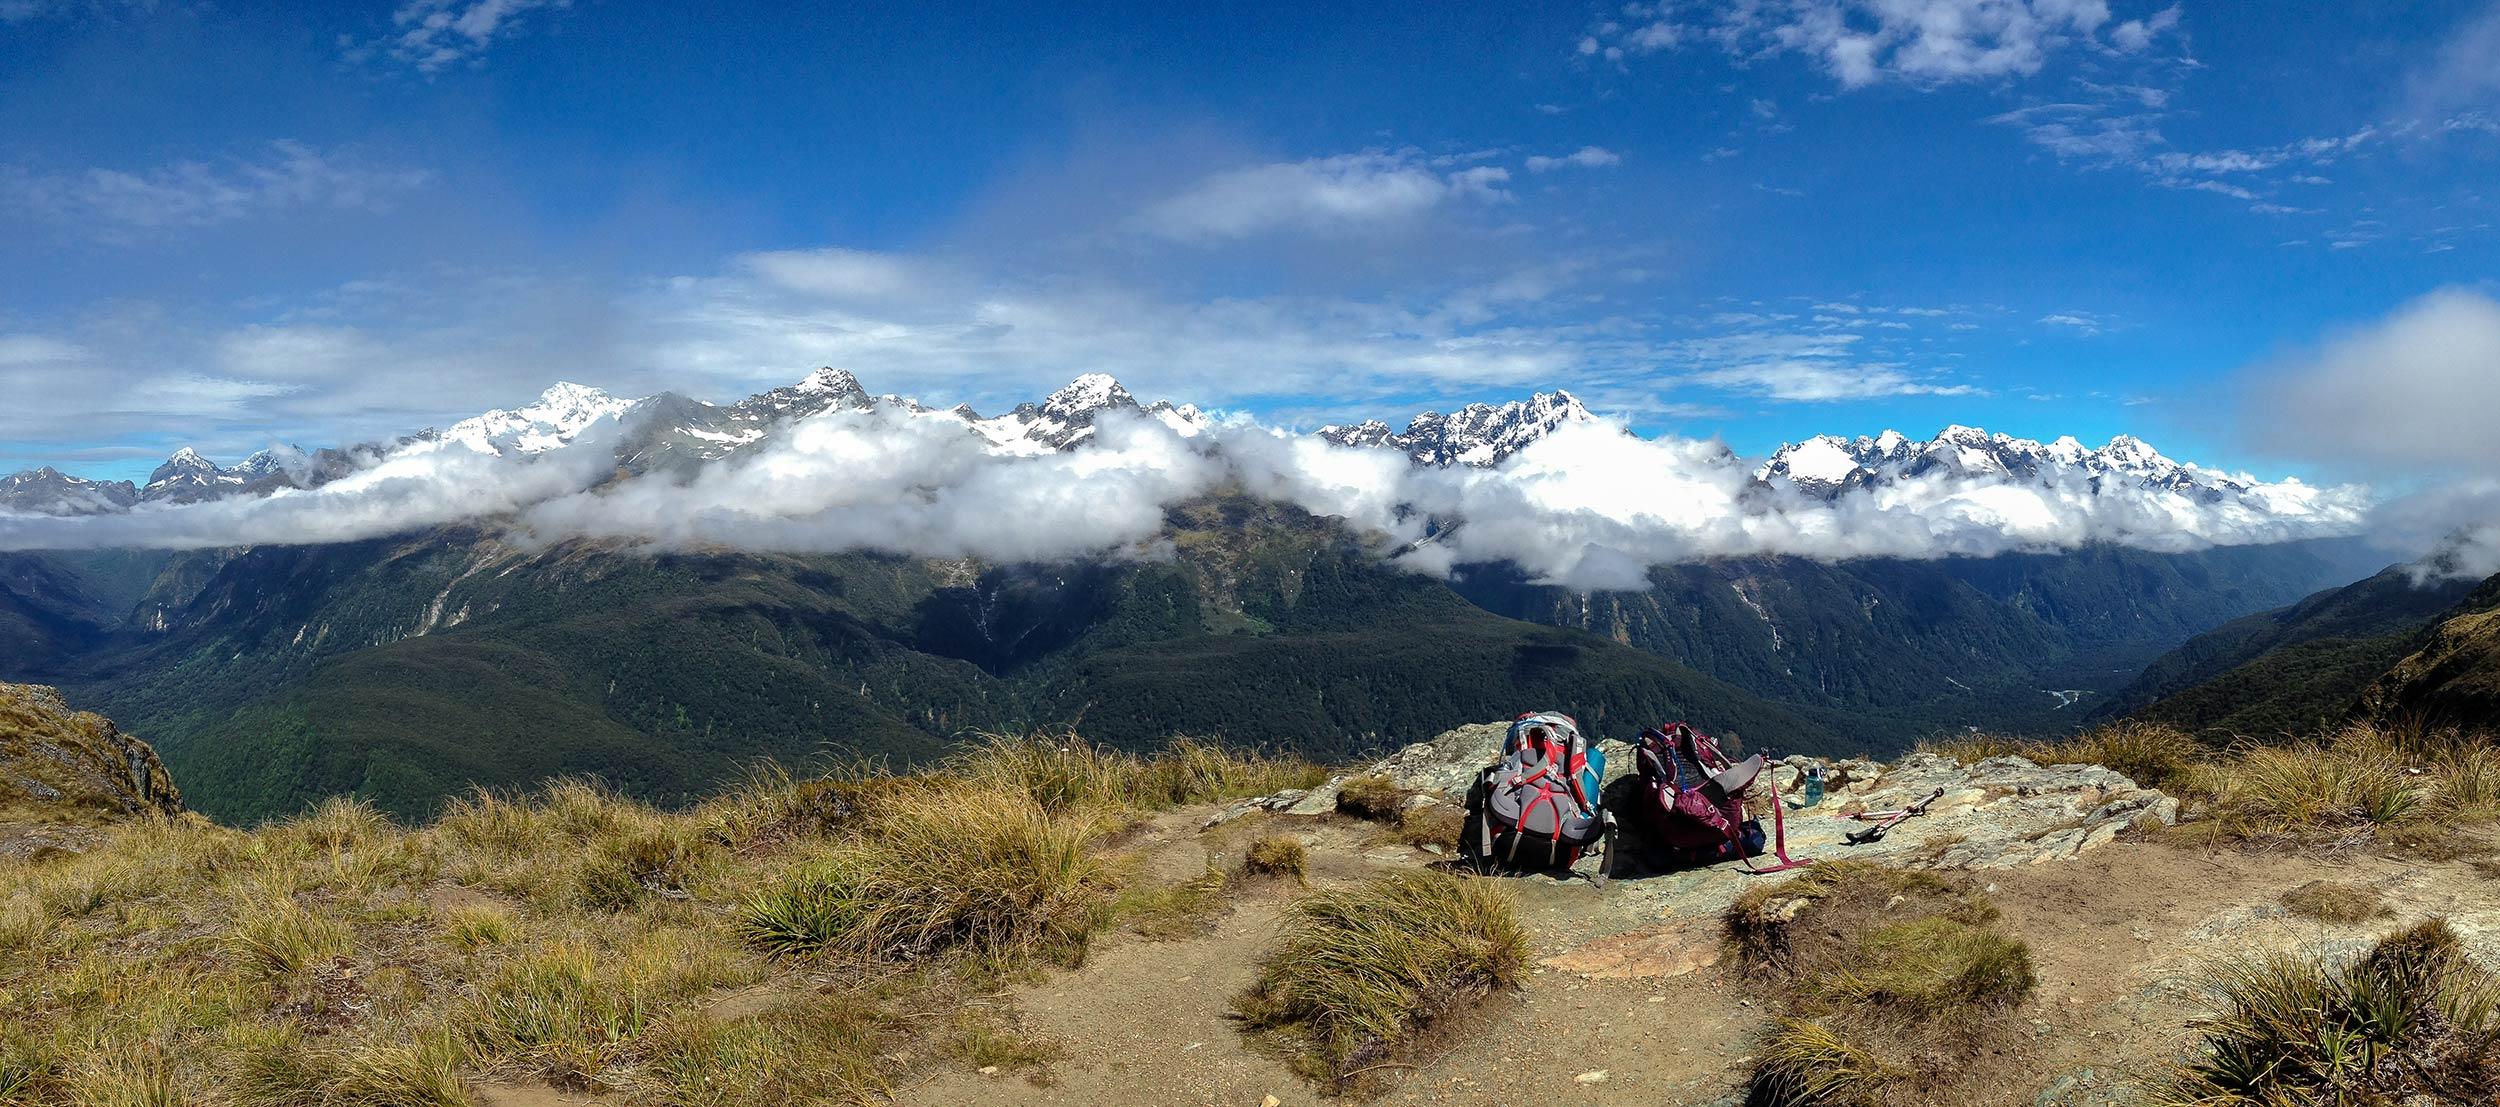 routeburn_track_backpacks_mountains_pano1.jpg